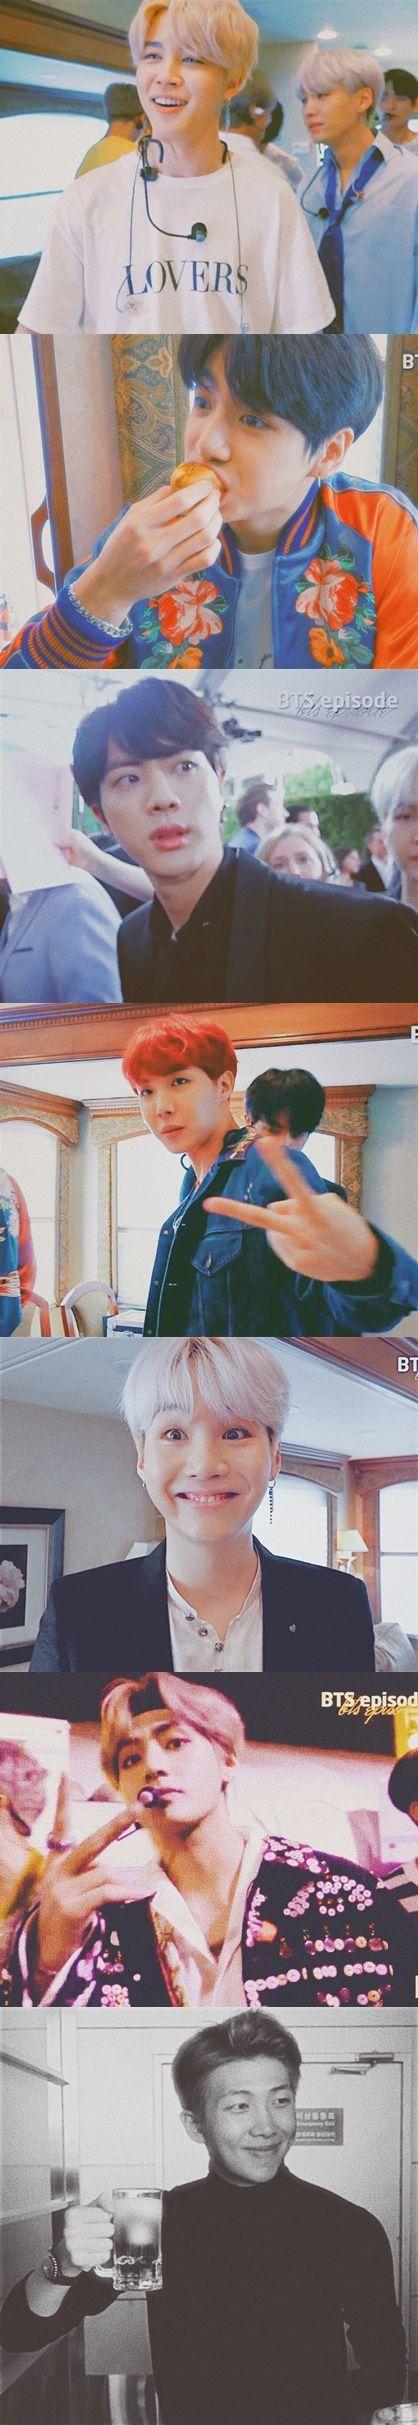 BTS ~❤️ | JIMIN, JUNGKOOK, V, RM, JIN, SUGA, JHOPE